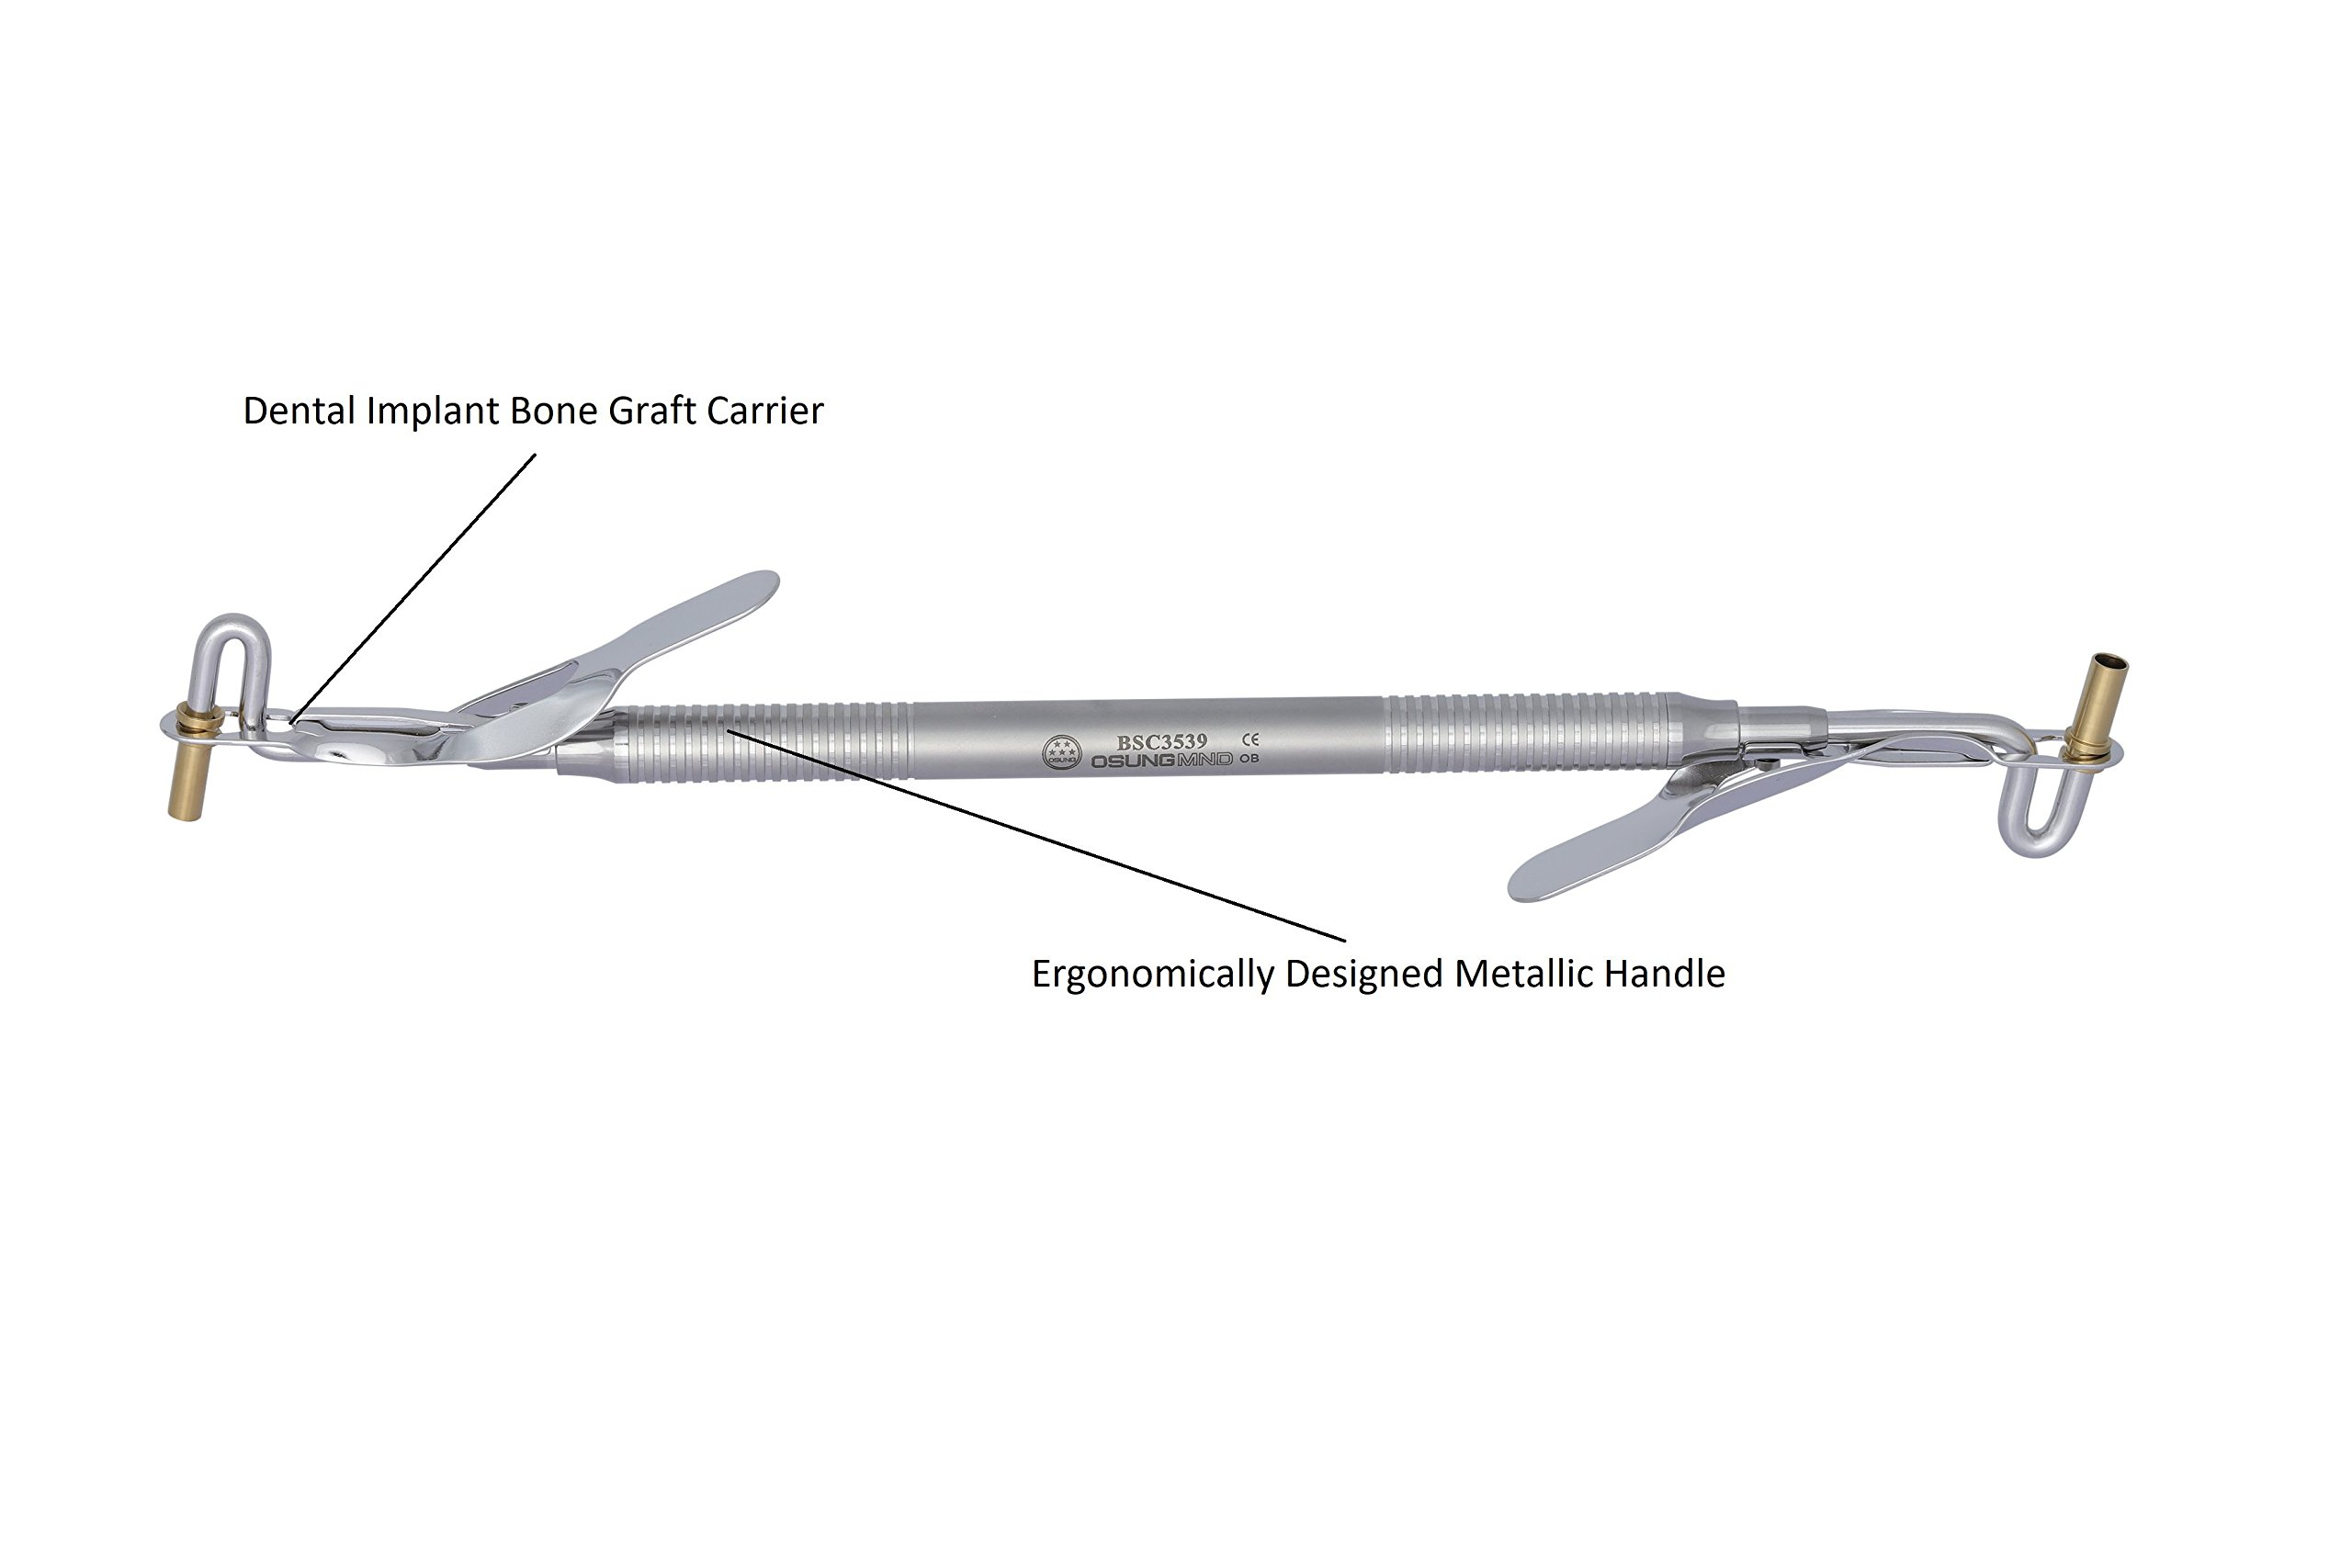 Implant Bone Carrier 3.5/3.9 mm dia